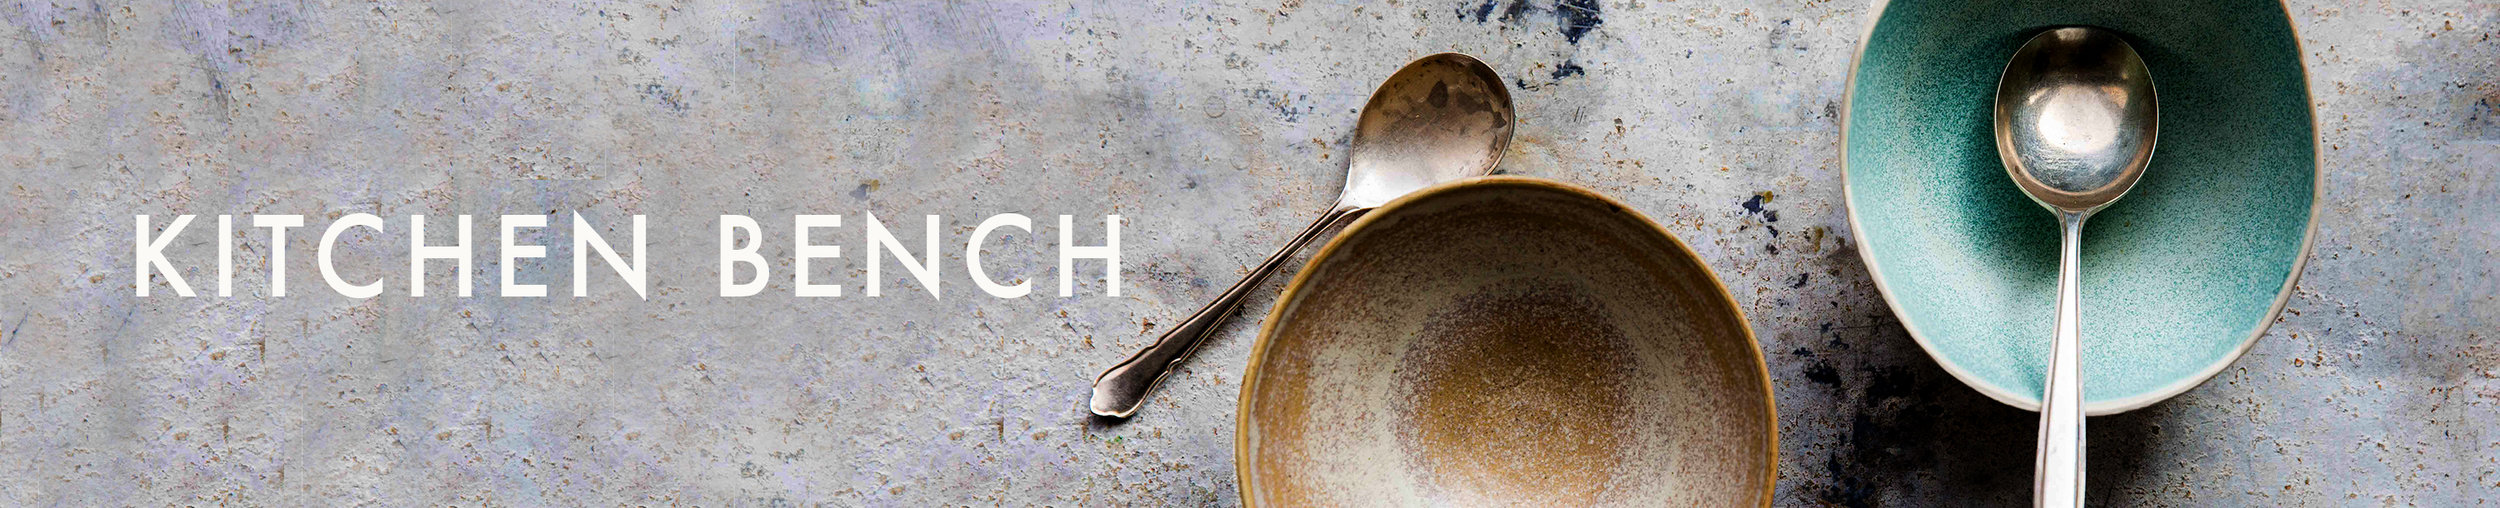 KitchenBench_Banner_EastbyWest_website.jpg